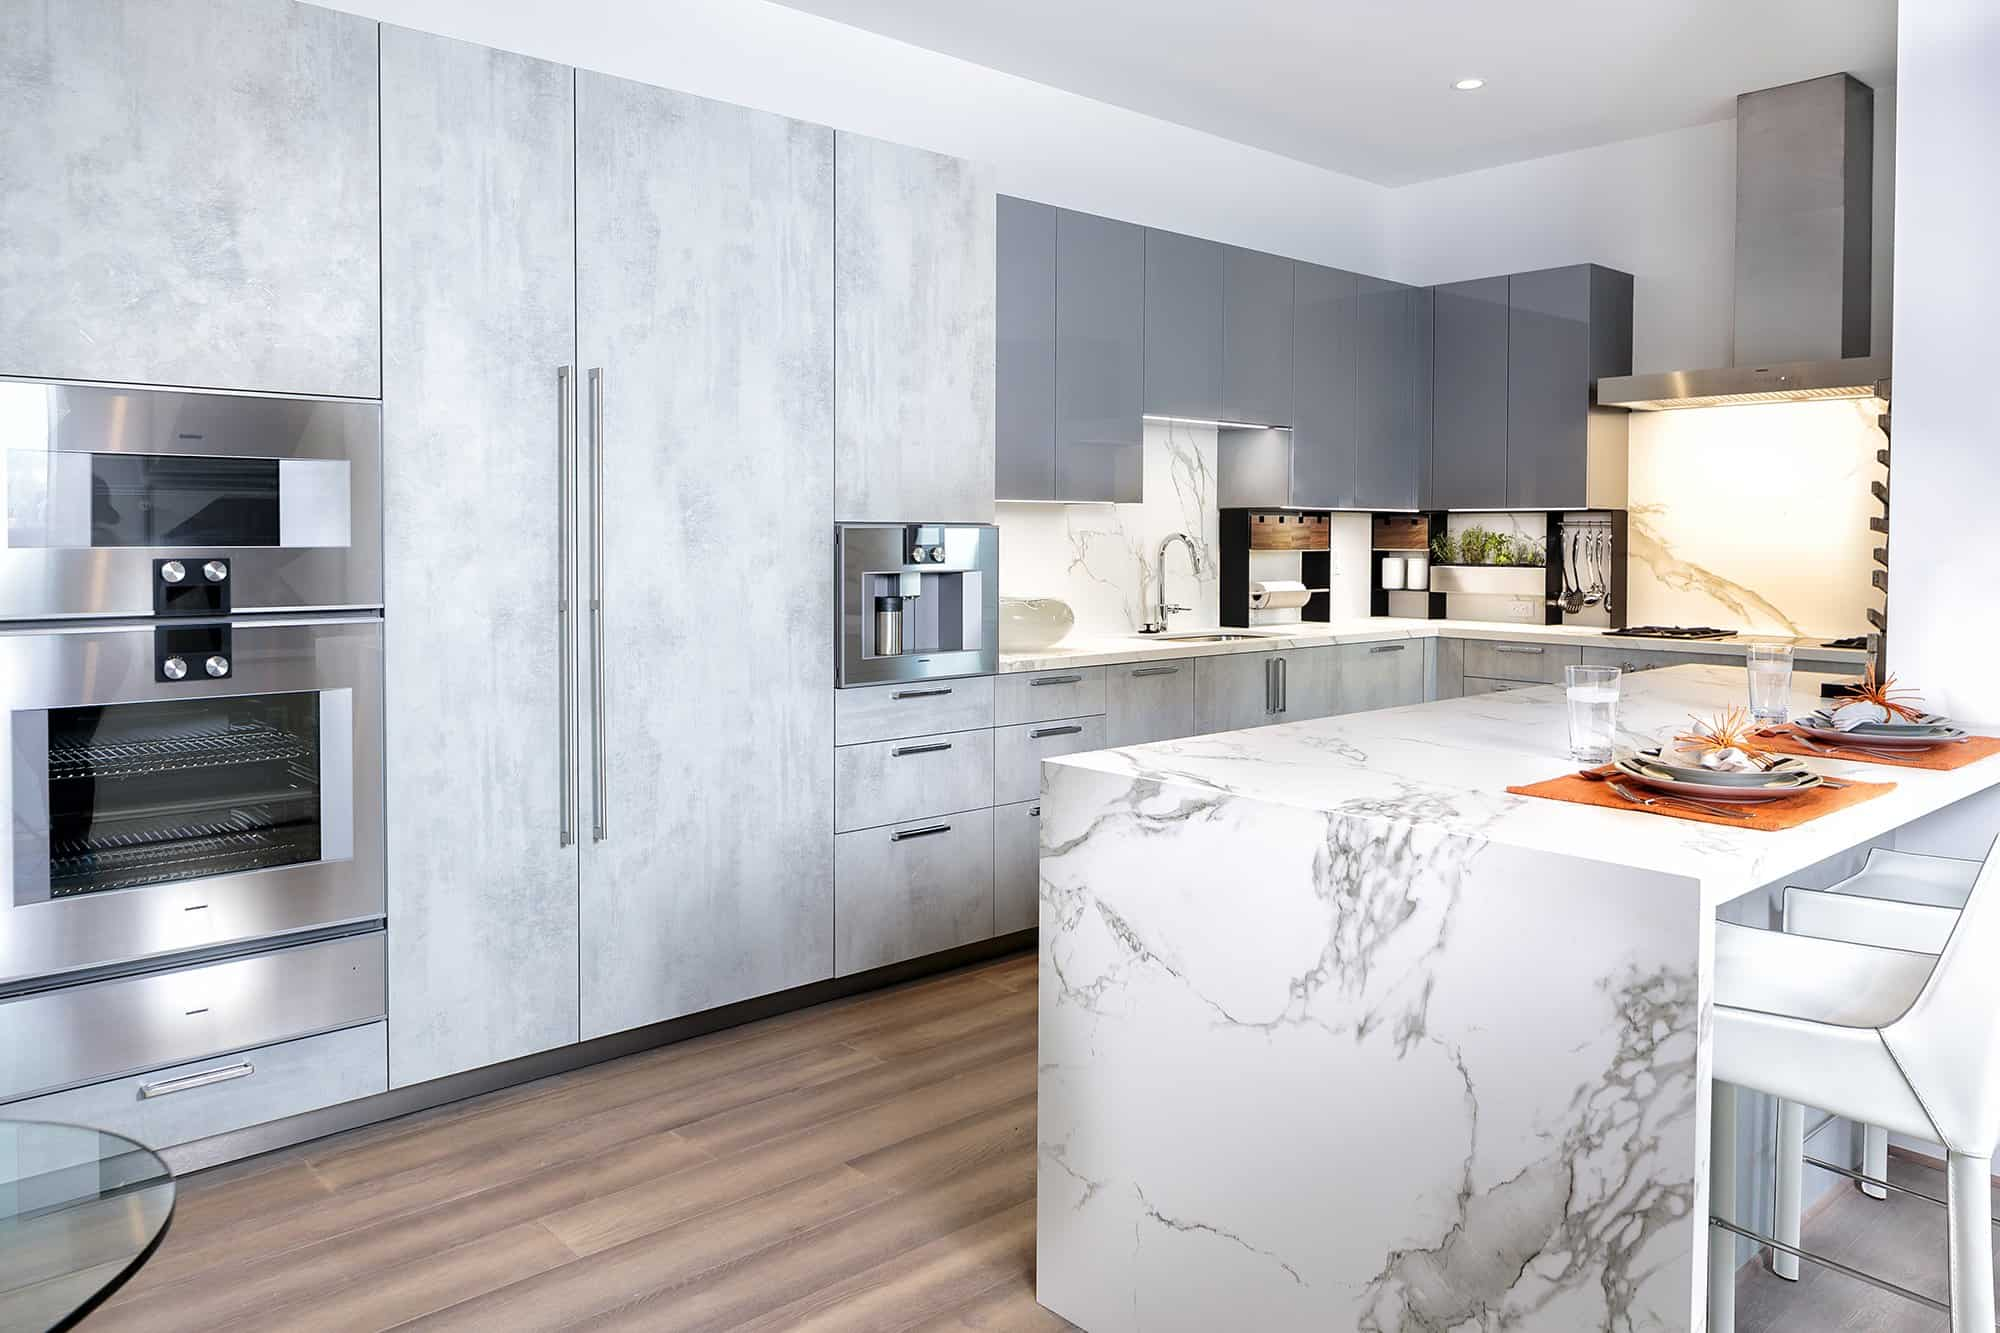 Concrete Decor and Grey High Gloss